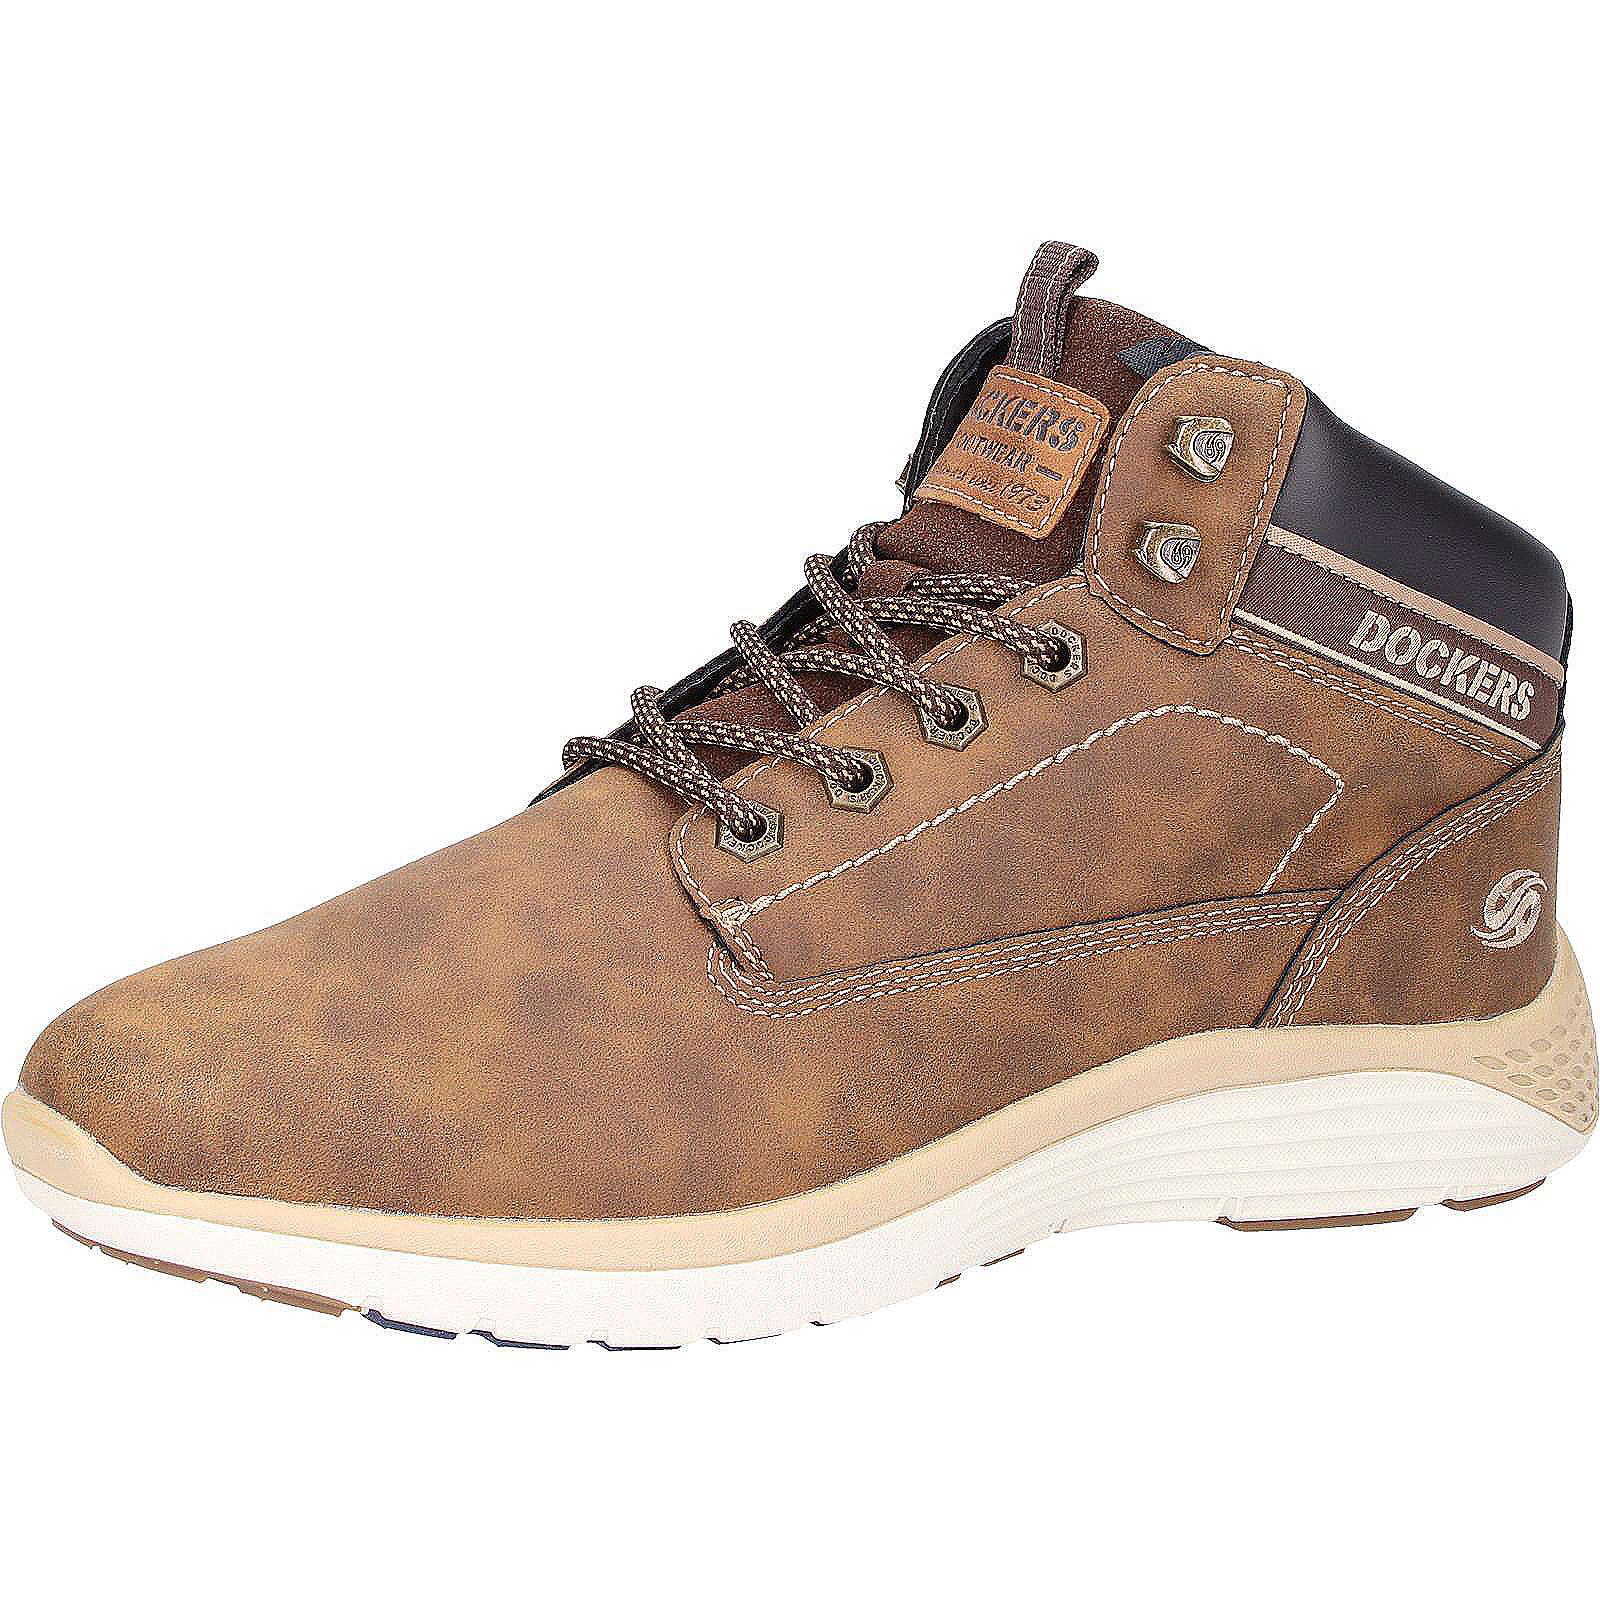 39cdaab6f5ba2f Dockers by Gerli Sneaker Sneakers High dunkelbraun Herren Gr. 42